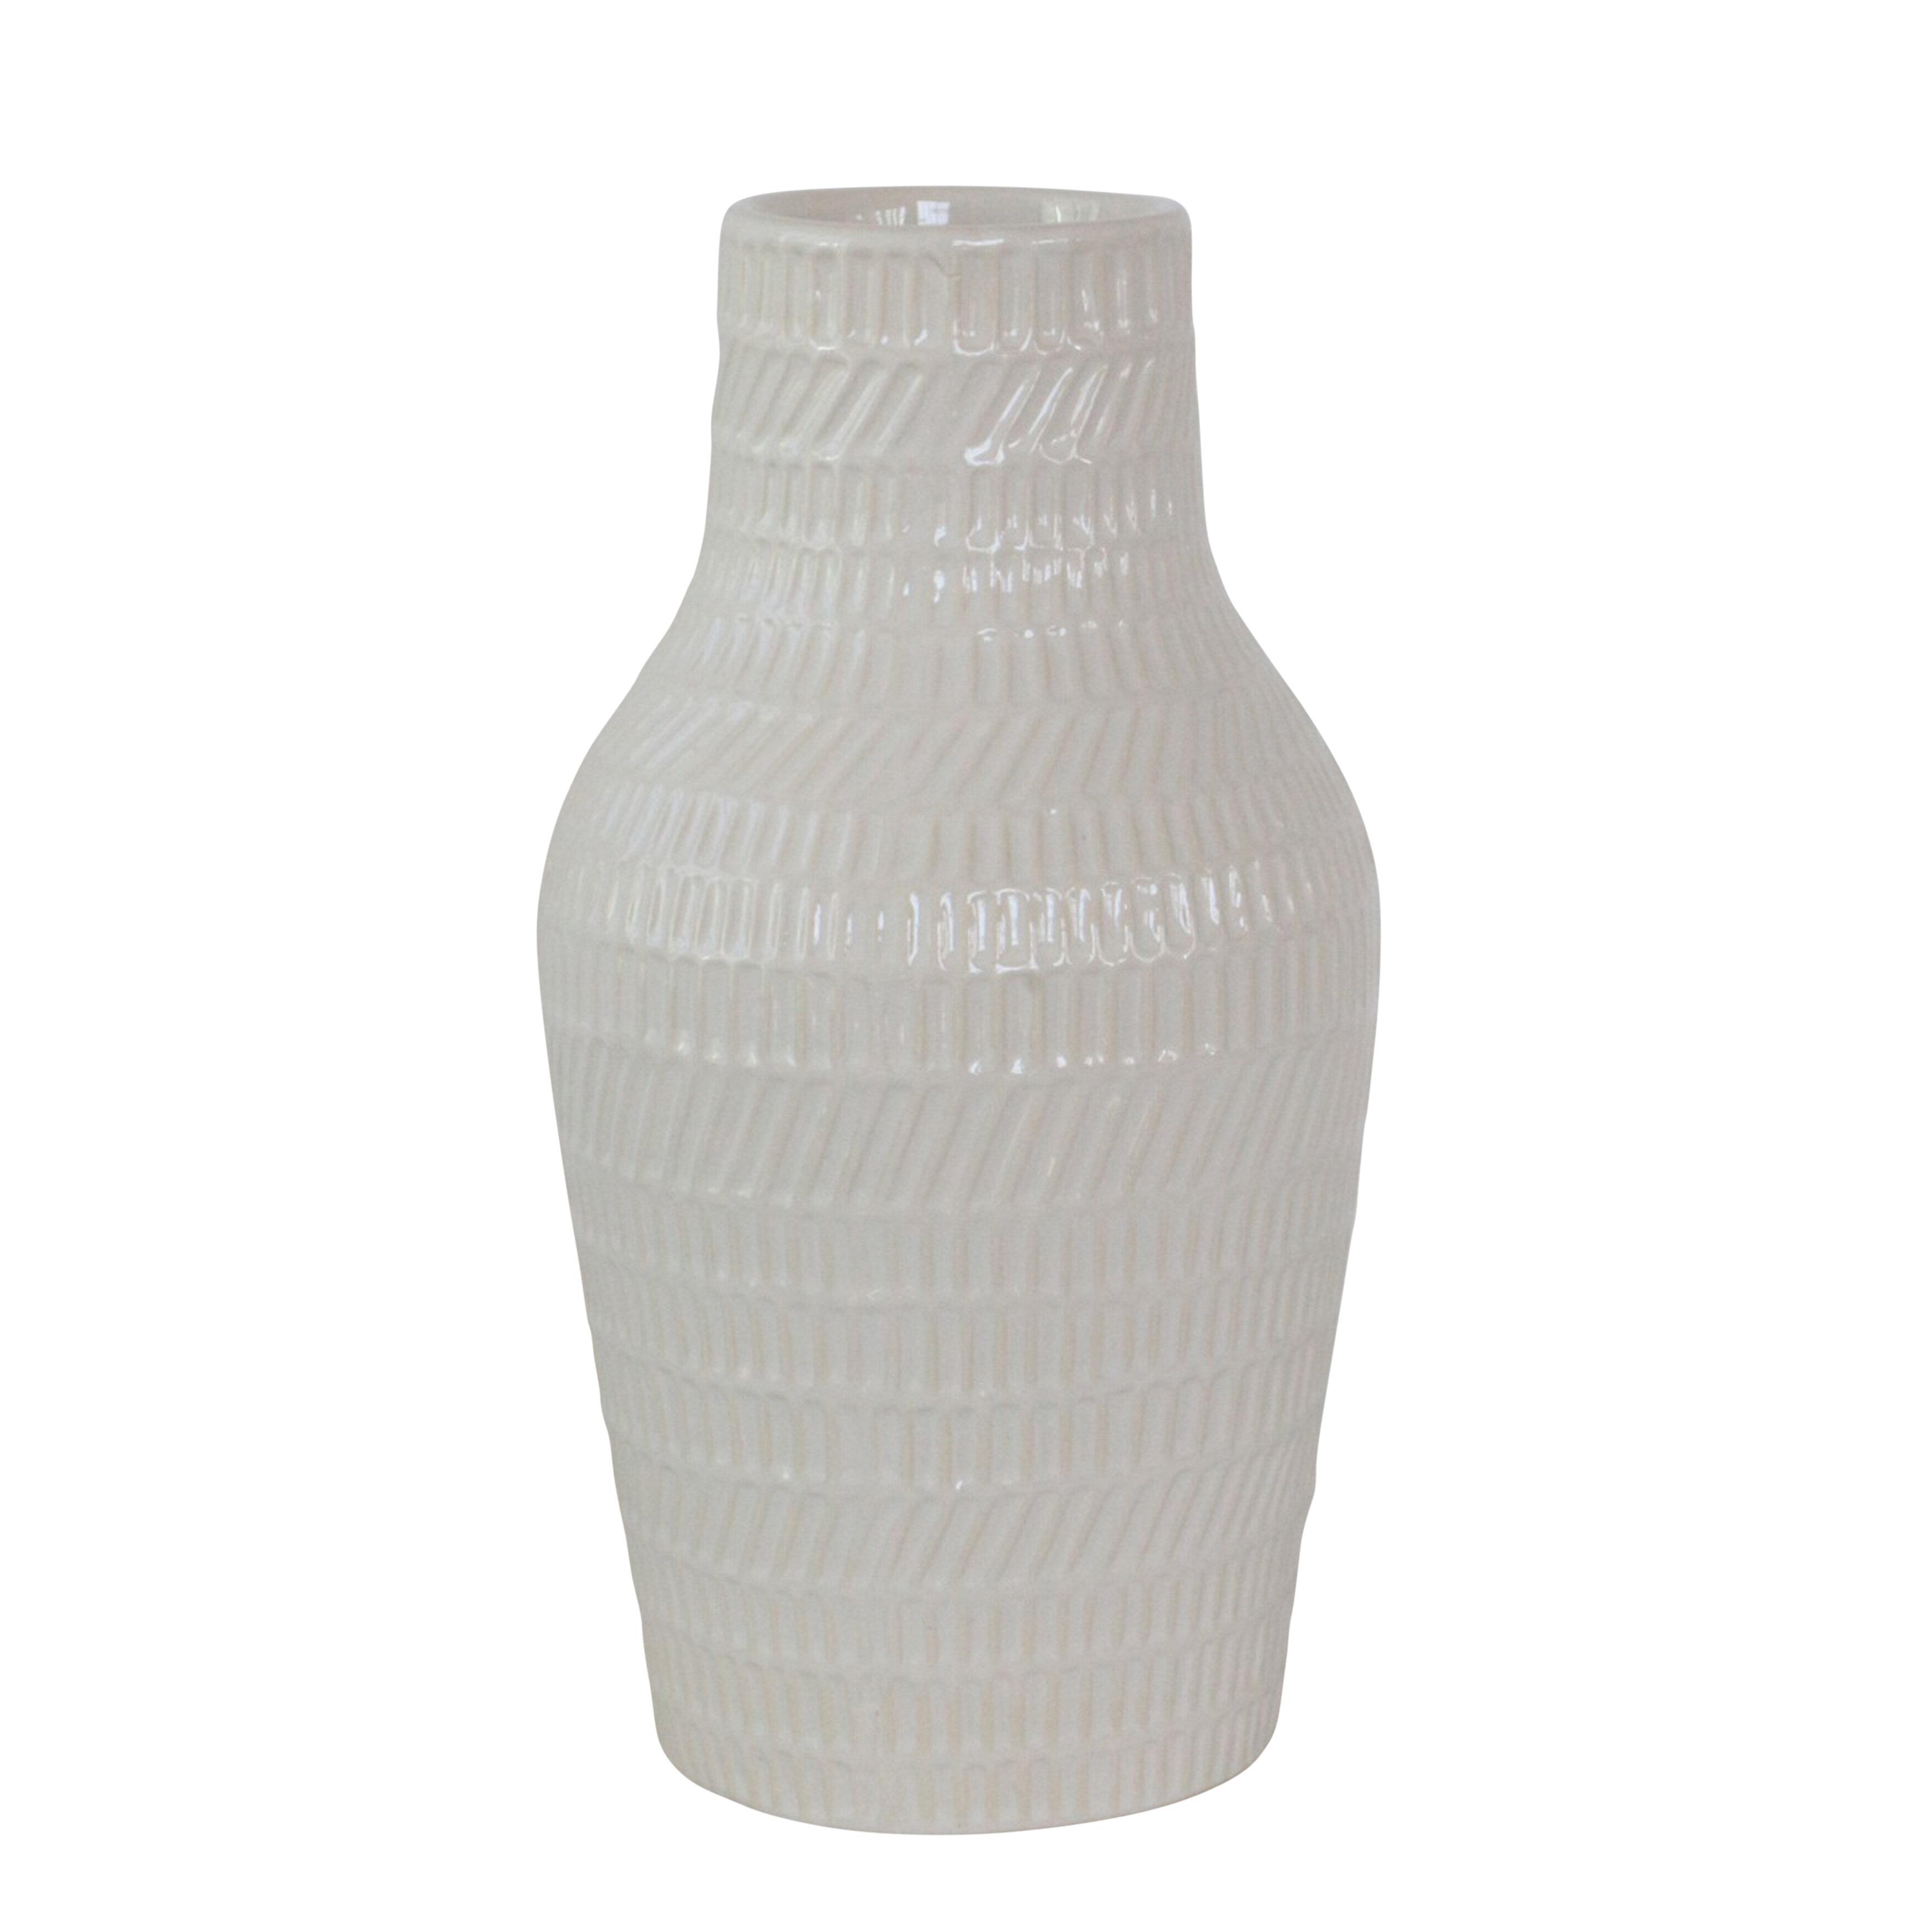 Ebern Designs Amanoa White 12 Ceramic Table Vase Wayfair